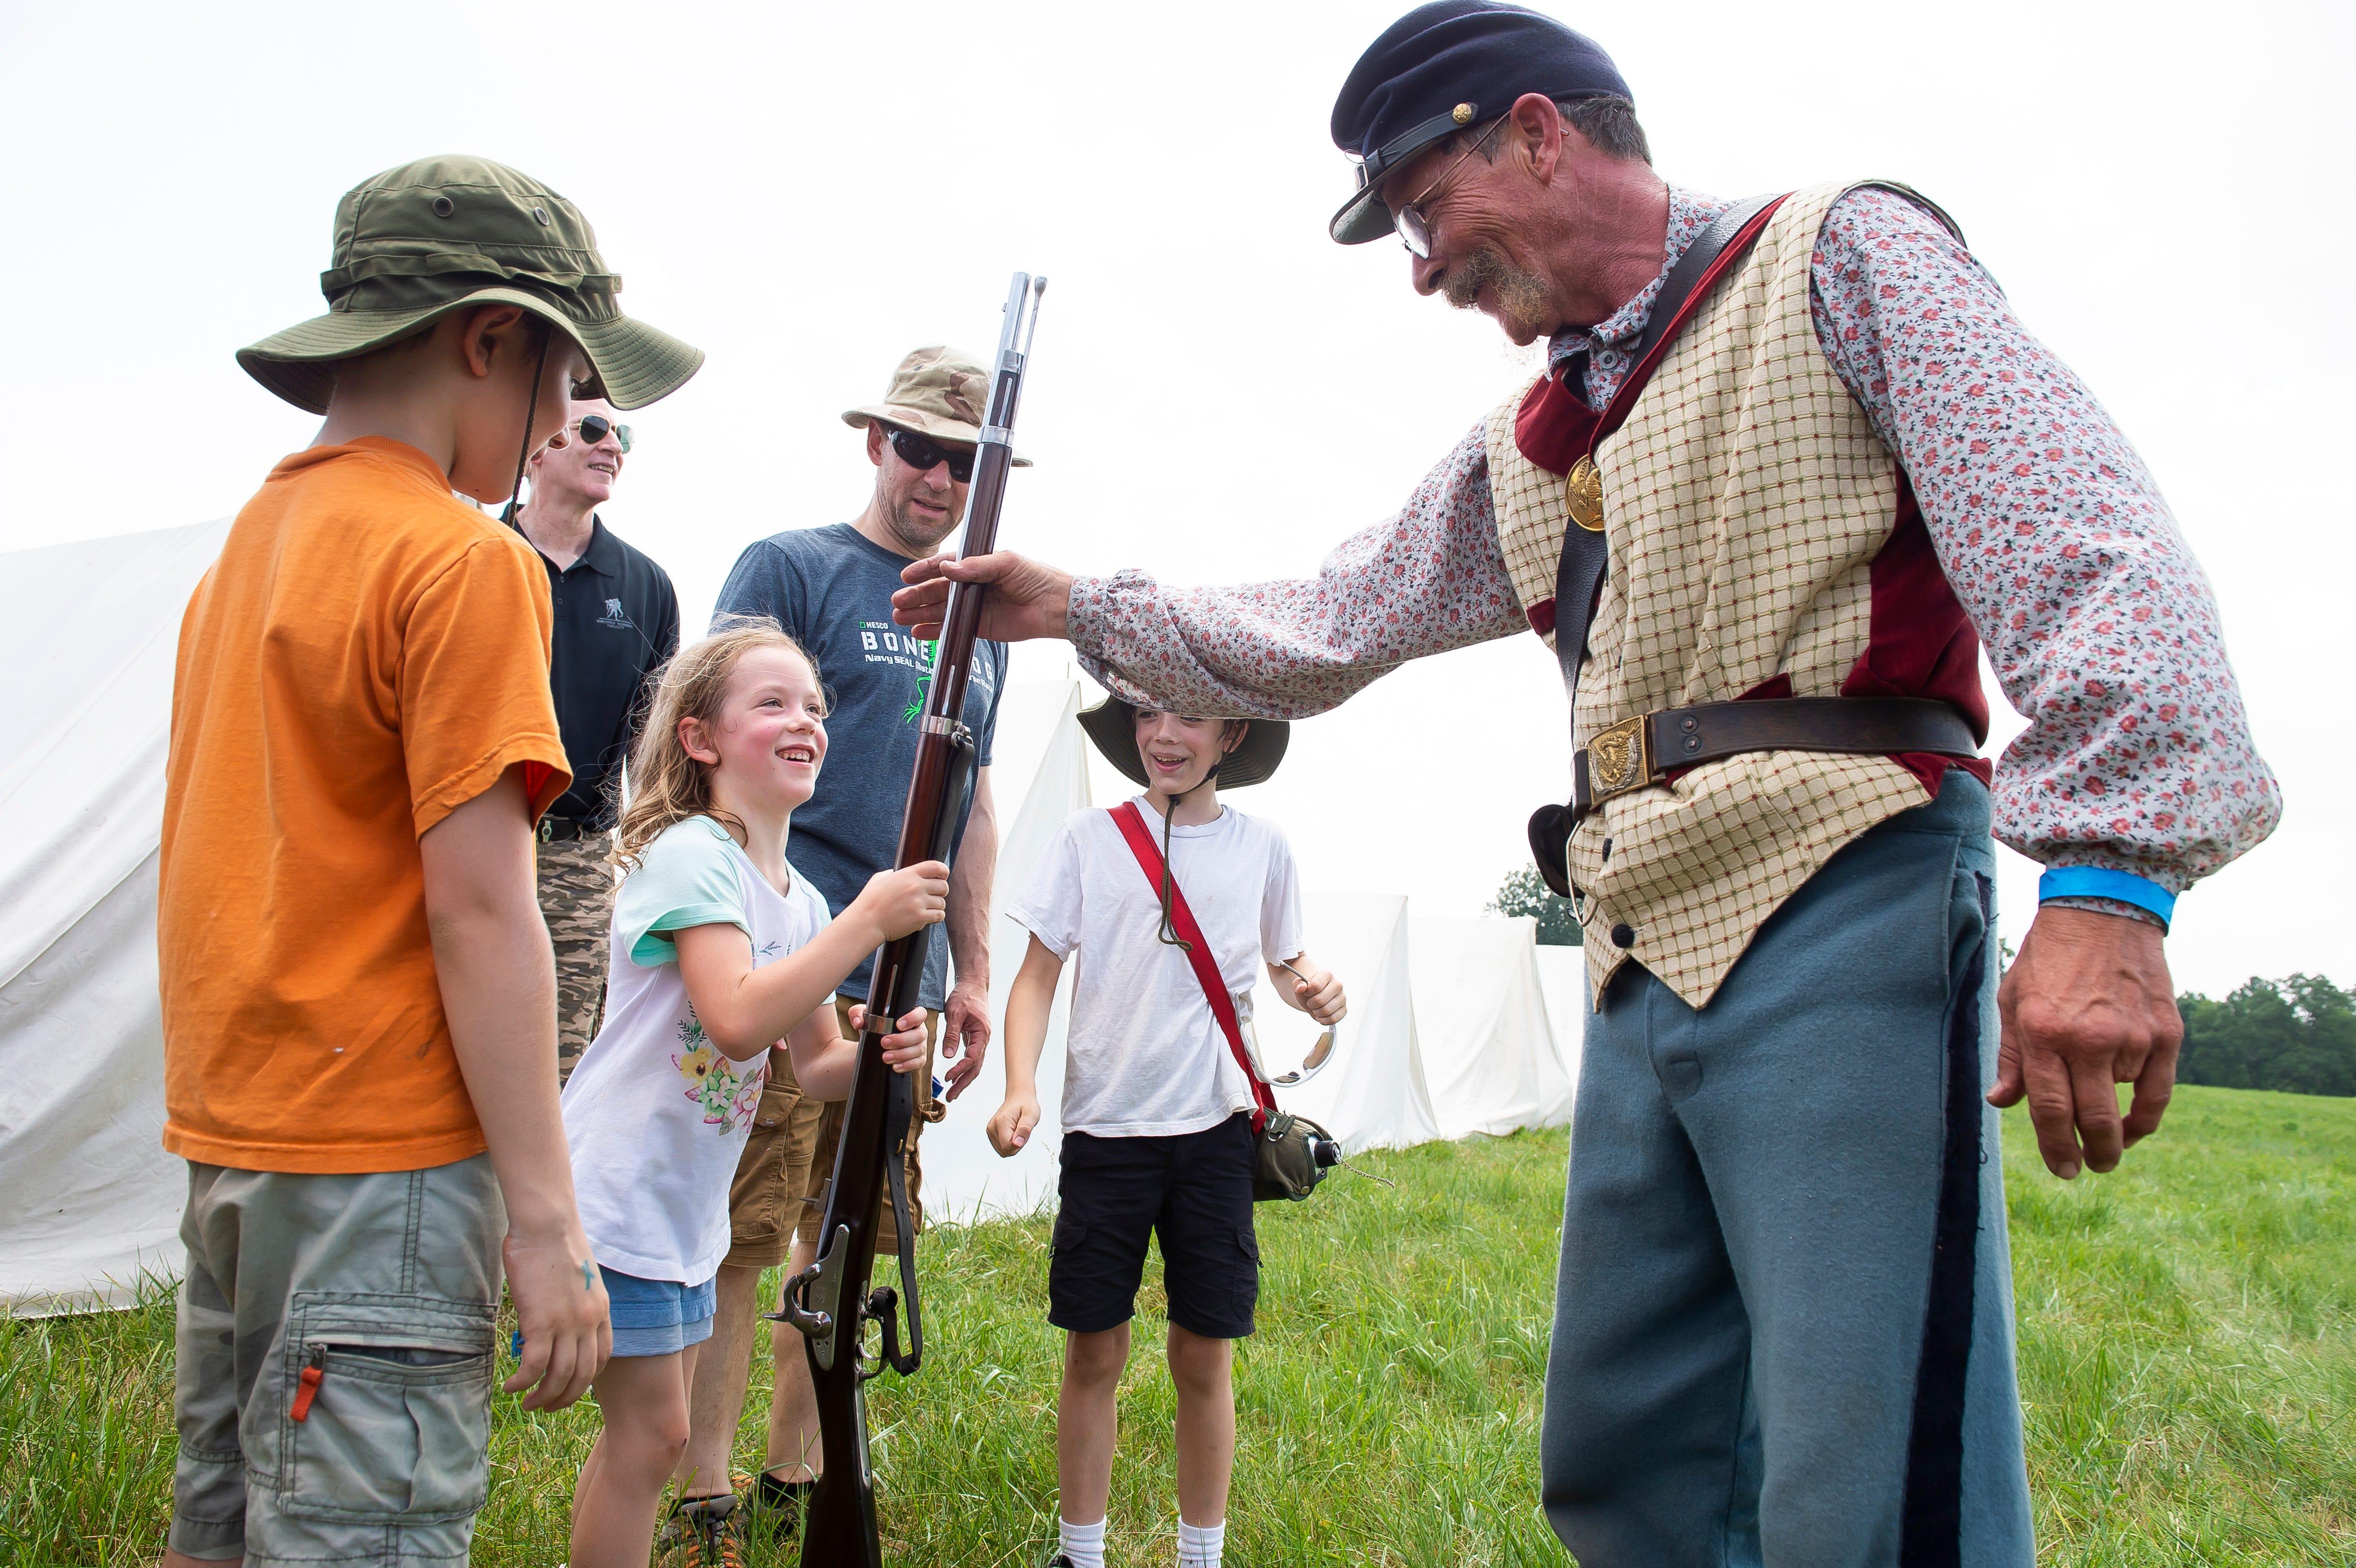 Gettysburg Civil War Reenactment won't be returning for